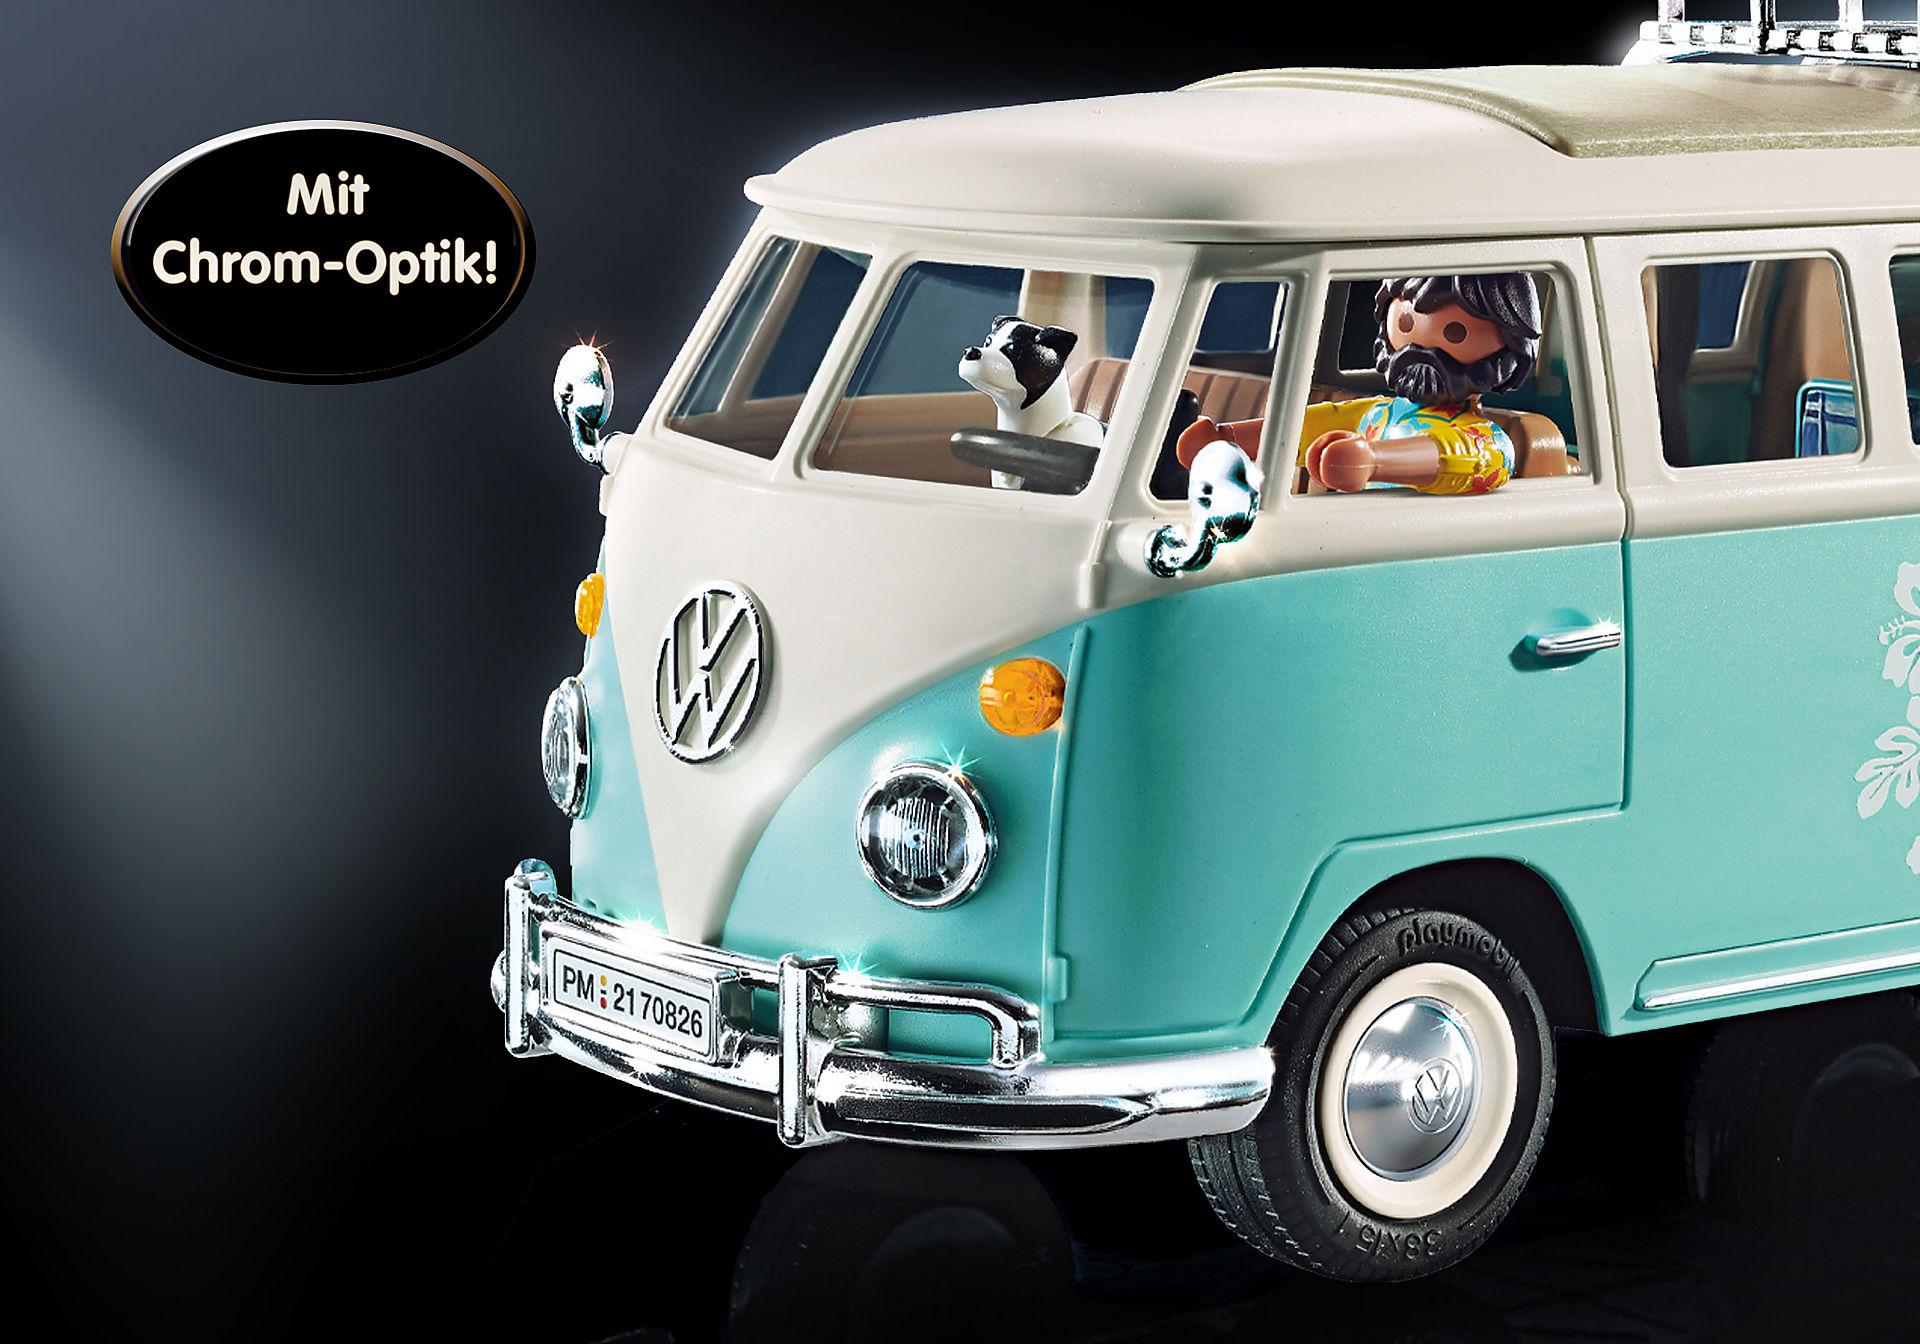 70826 Volkswagen T1 Campingbus - Special Edition zoom image4